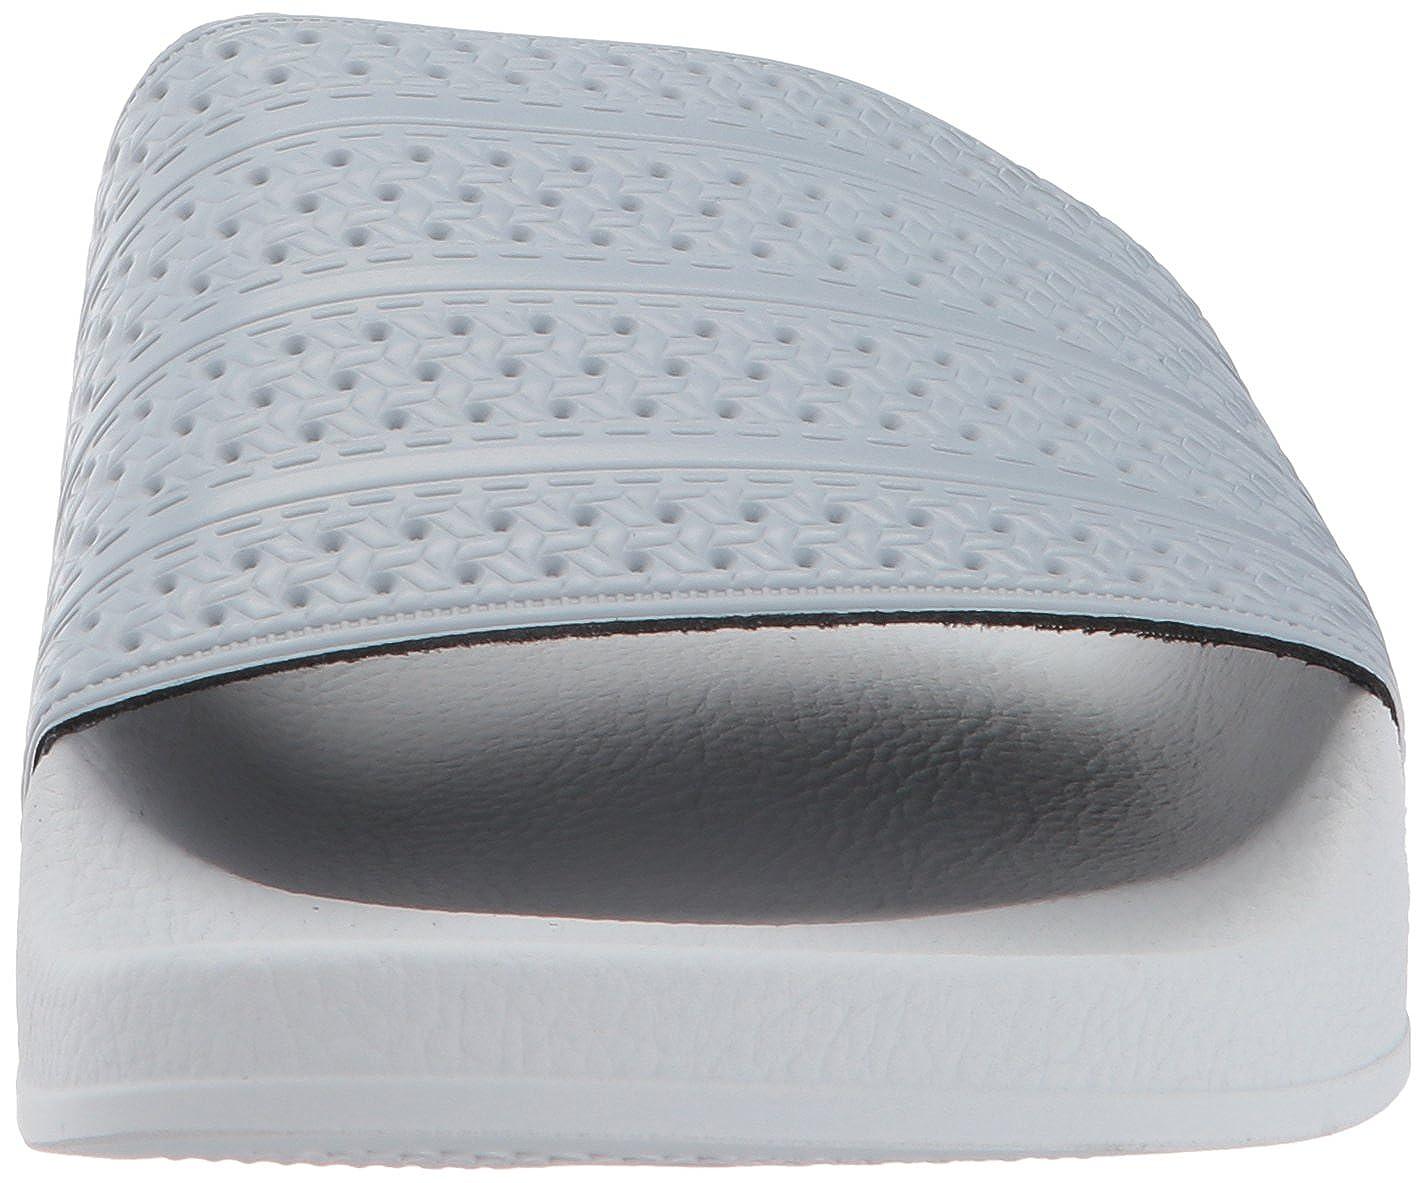 Adidas Unisex-Erwachsene Unisex-Erwachsene Unisex-Erwachsene Originals ADILETTE Bade Sandalen  6de4c2